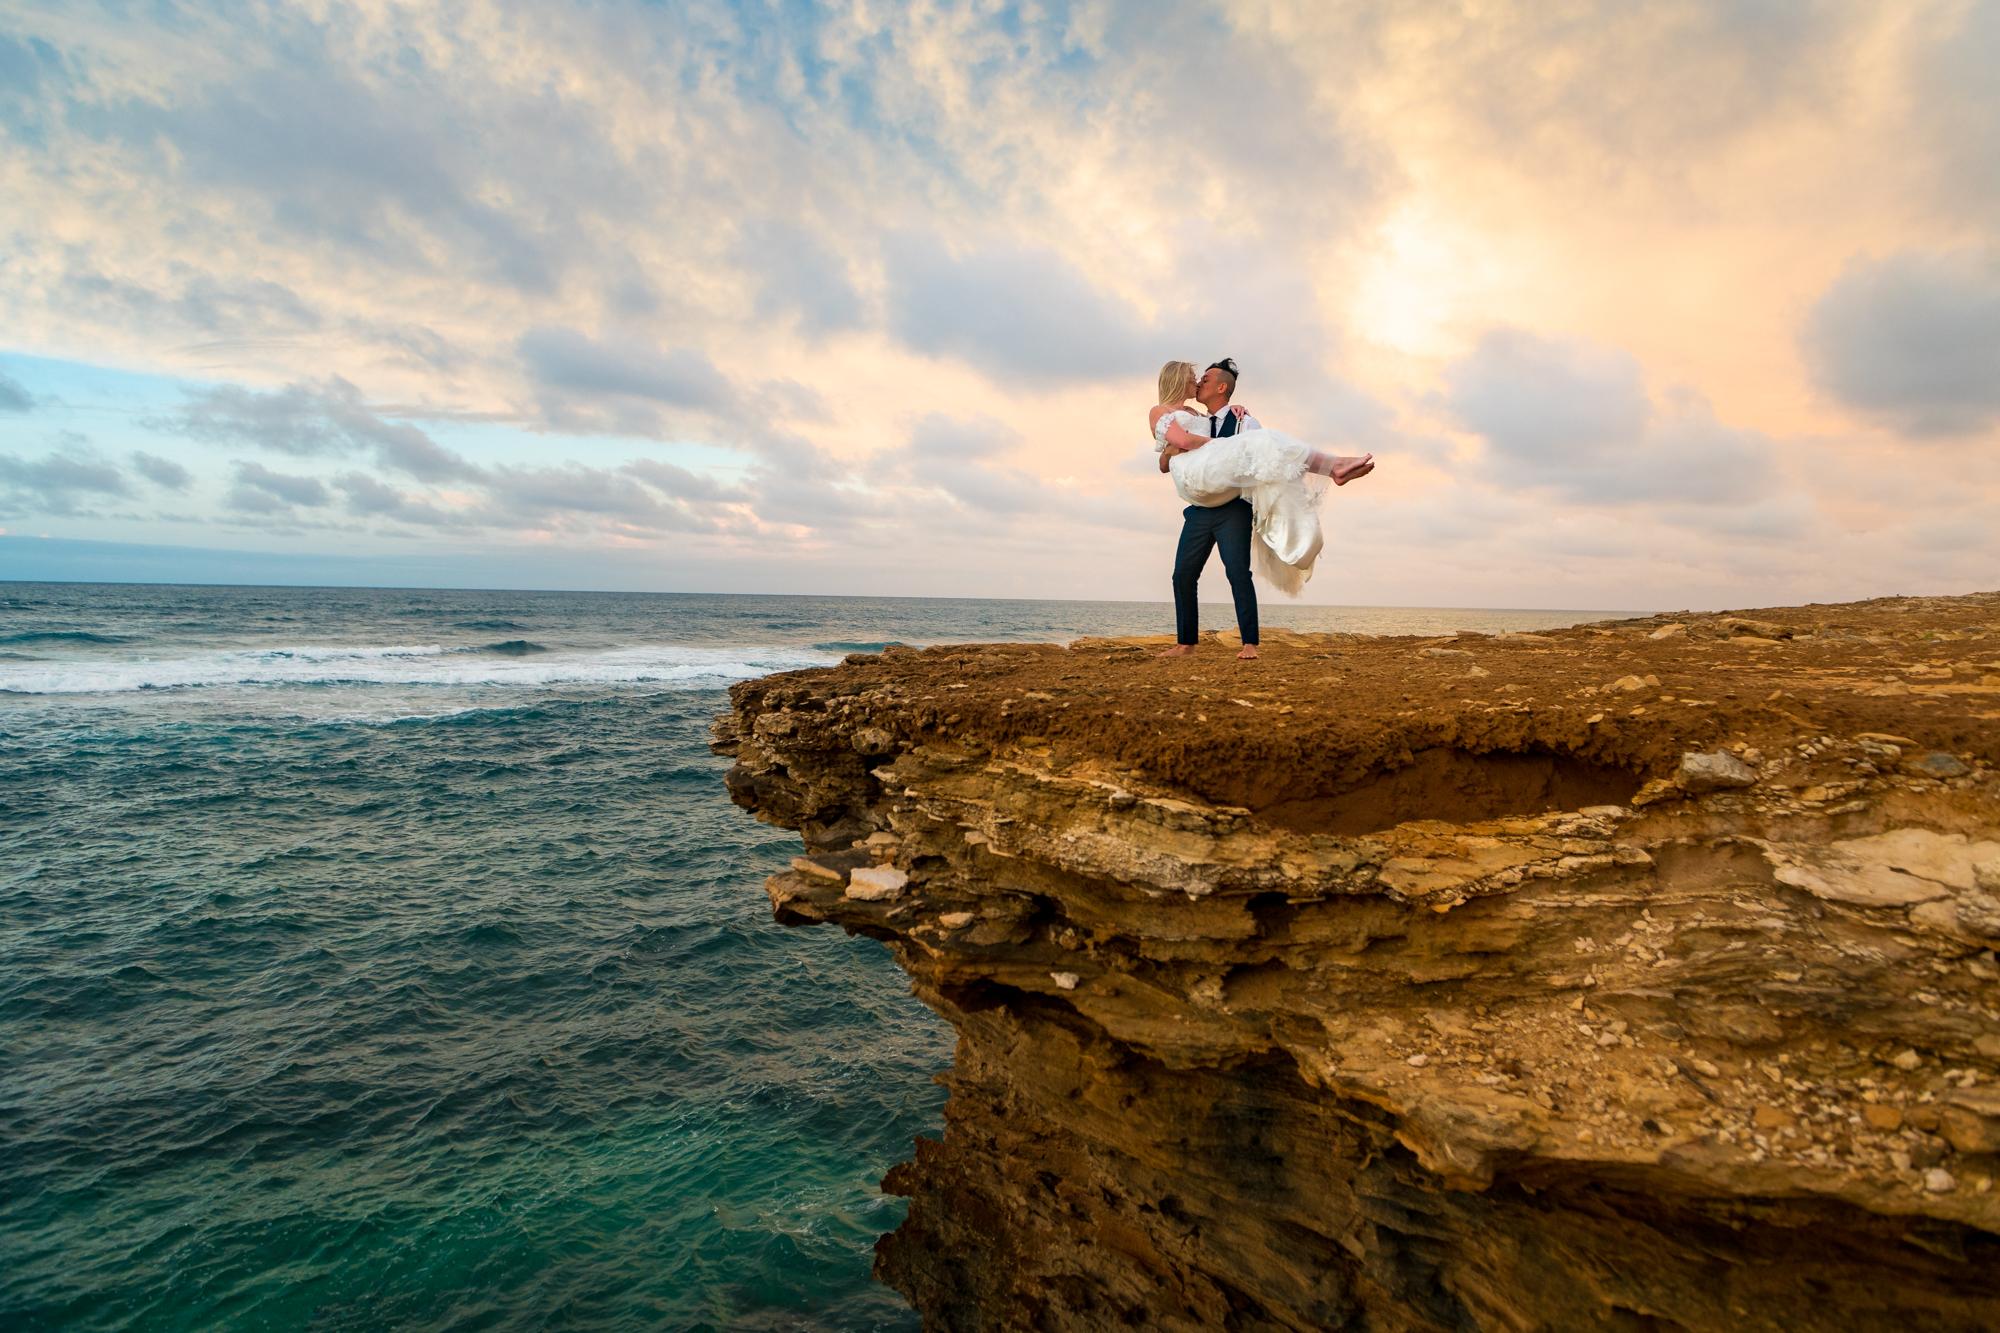 sunrise-wedding-coleen-shipwrecks-6-29-2919-9132.jpg